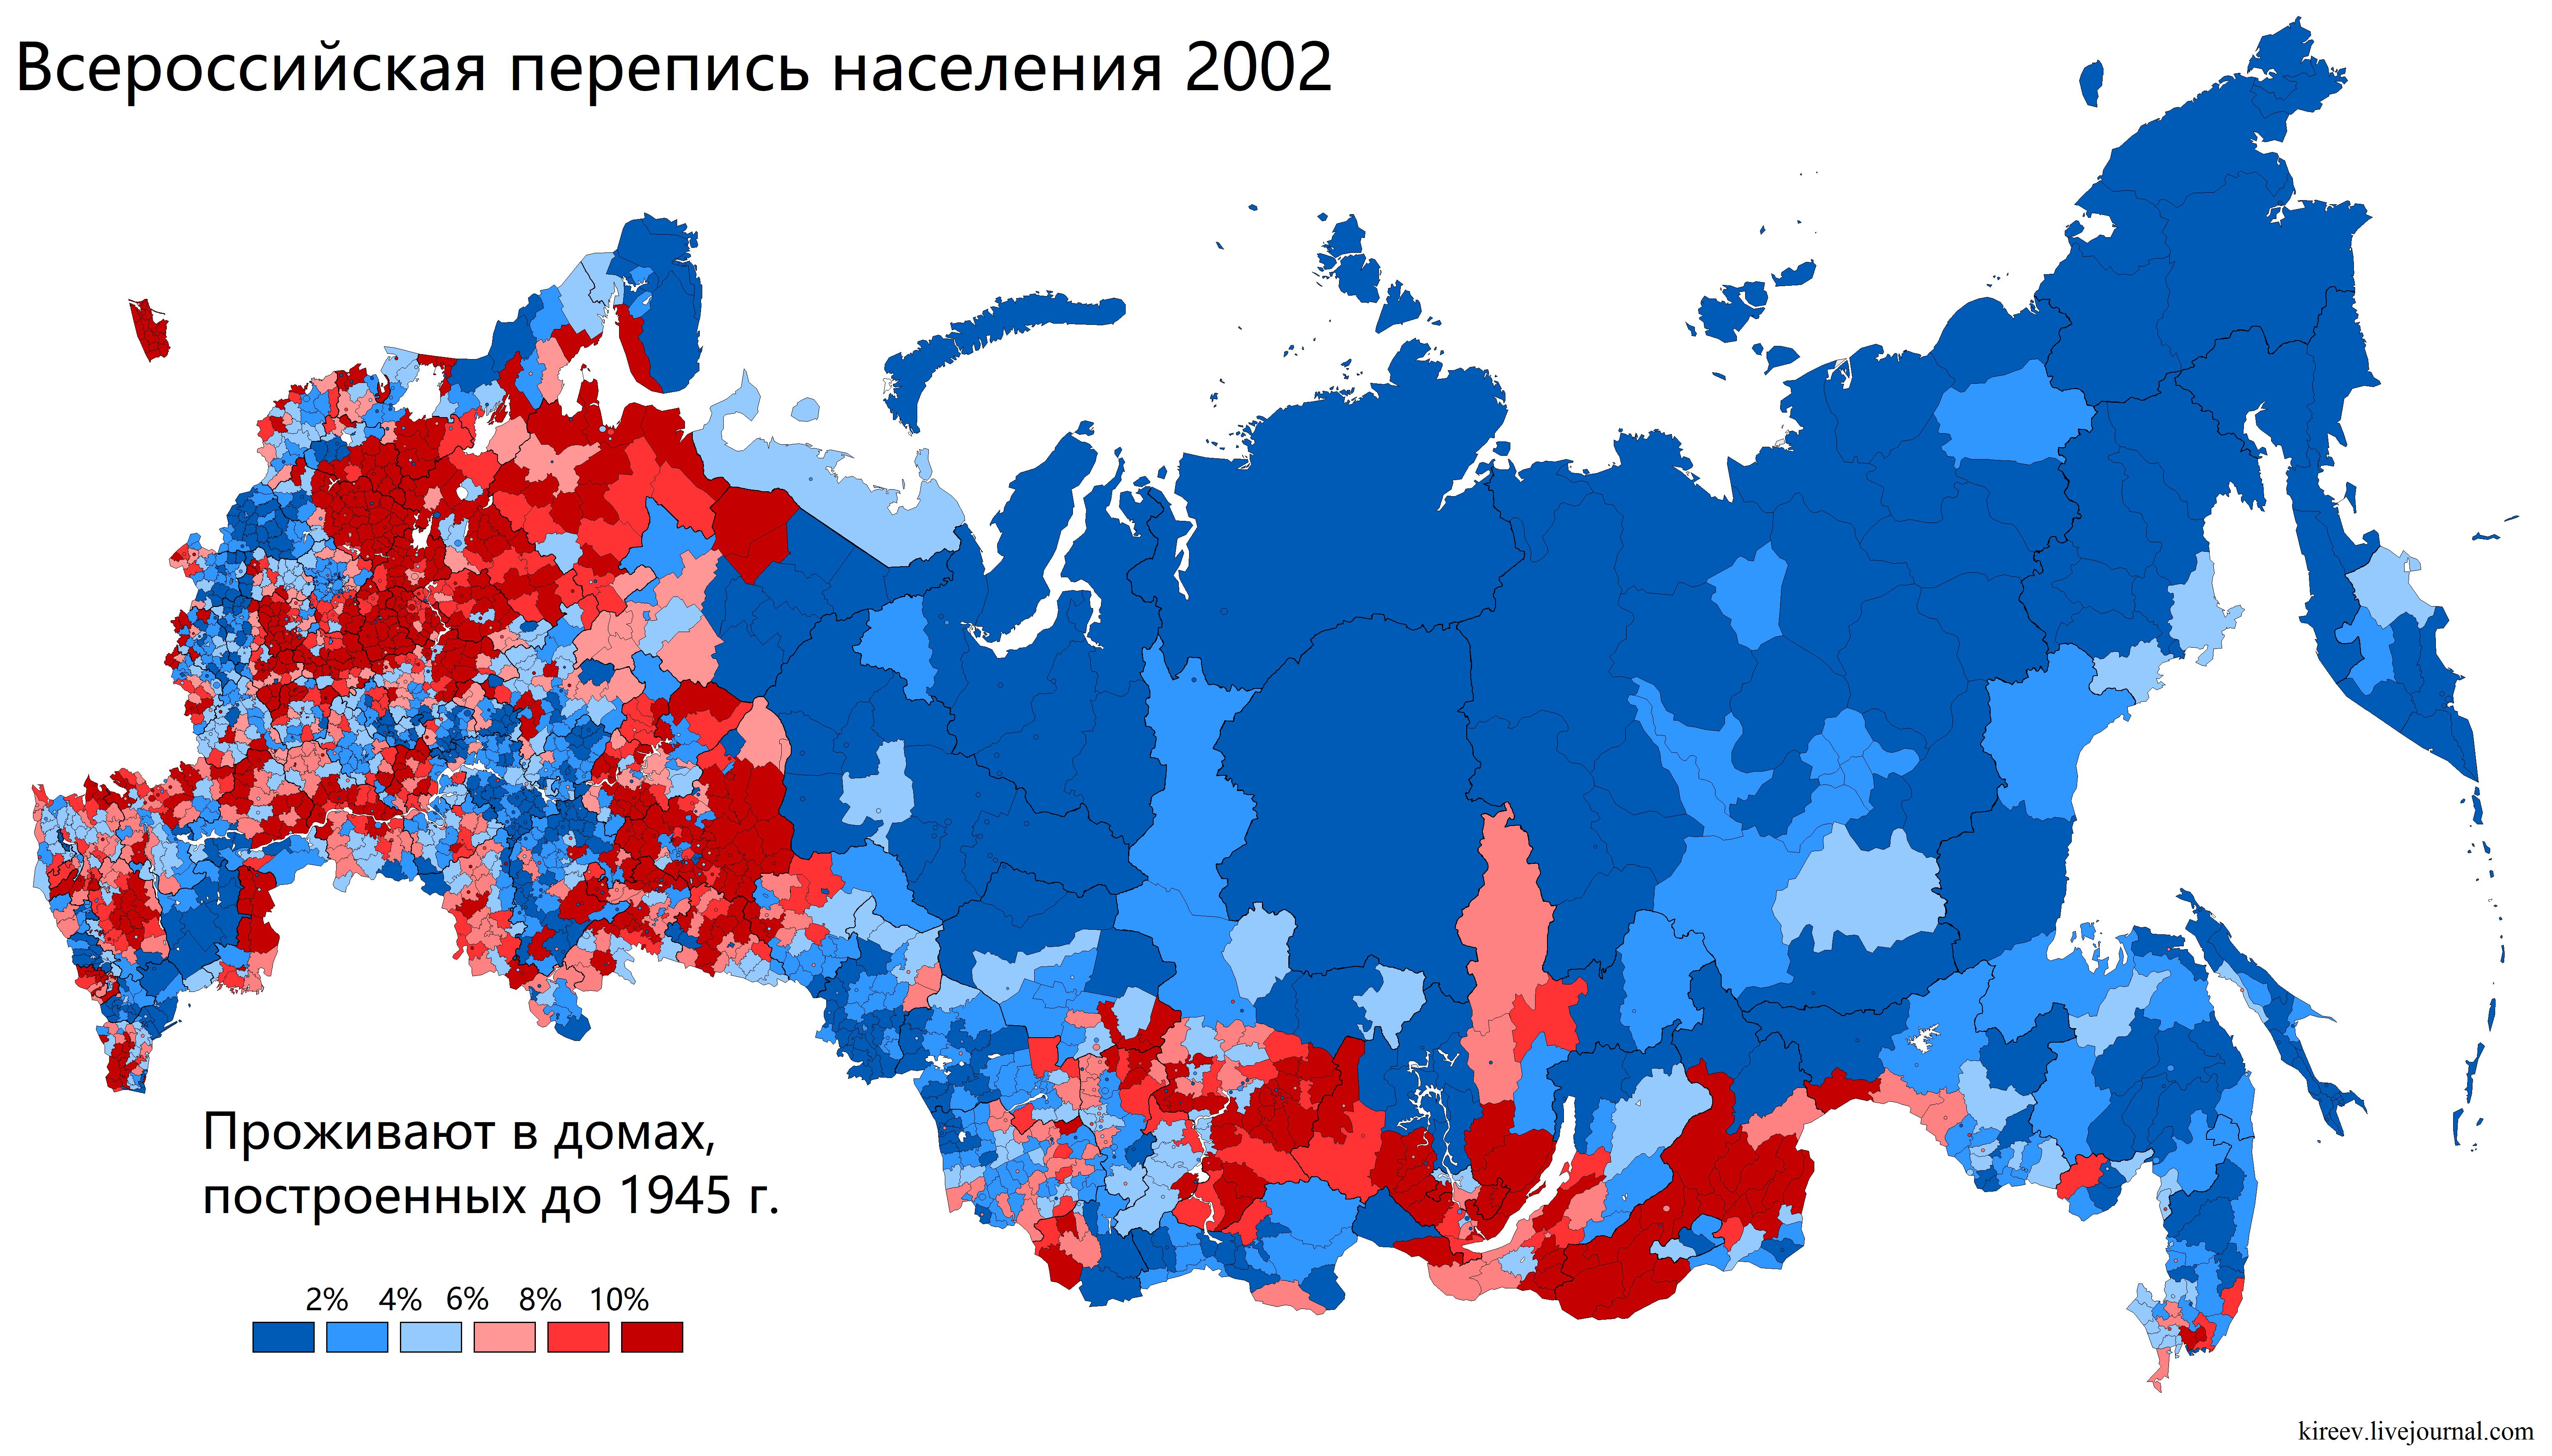 map-russia-buildings-older-1945